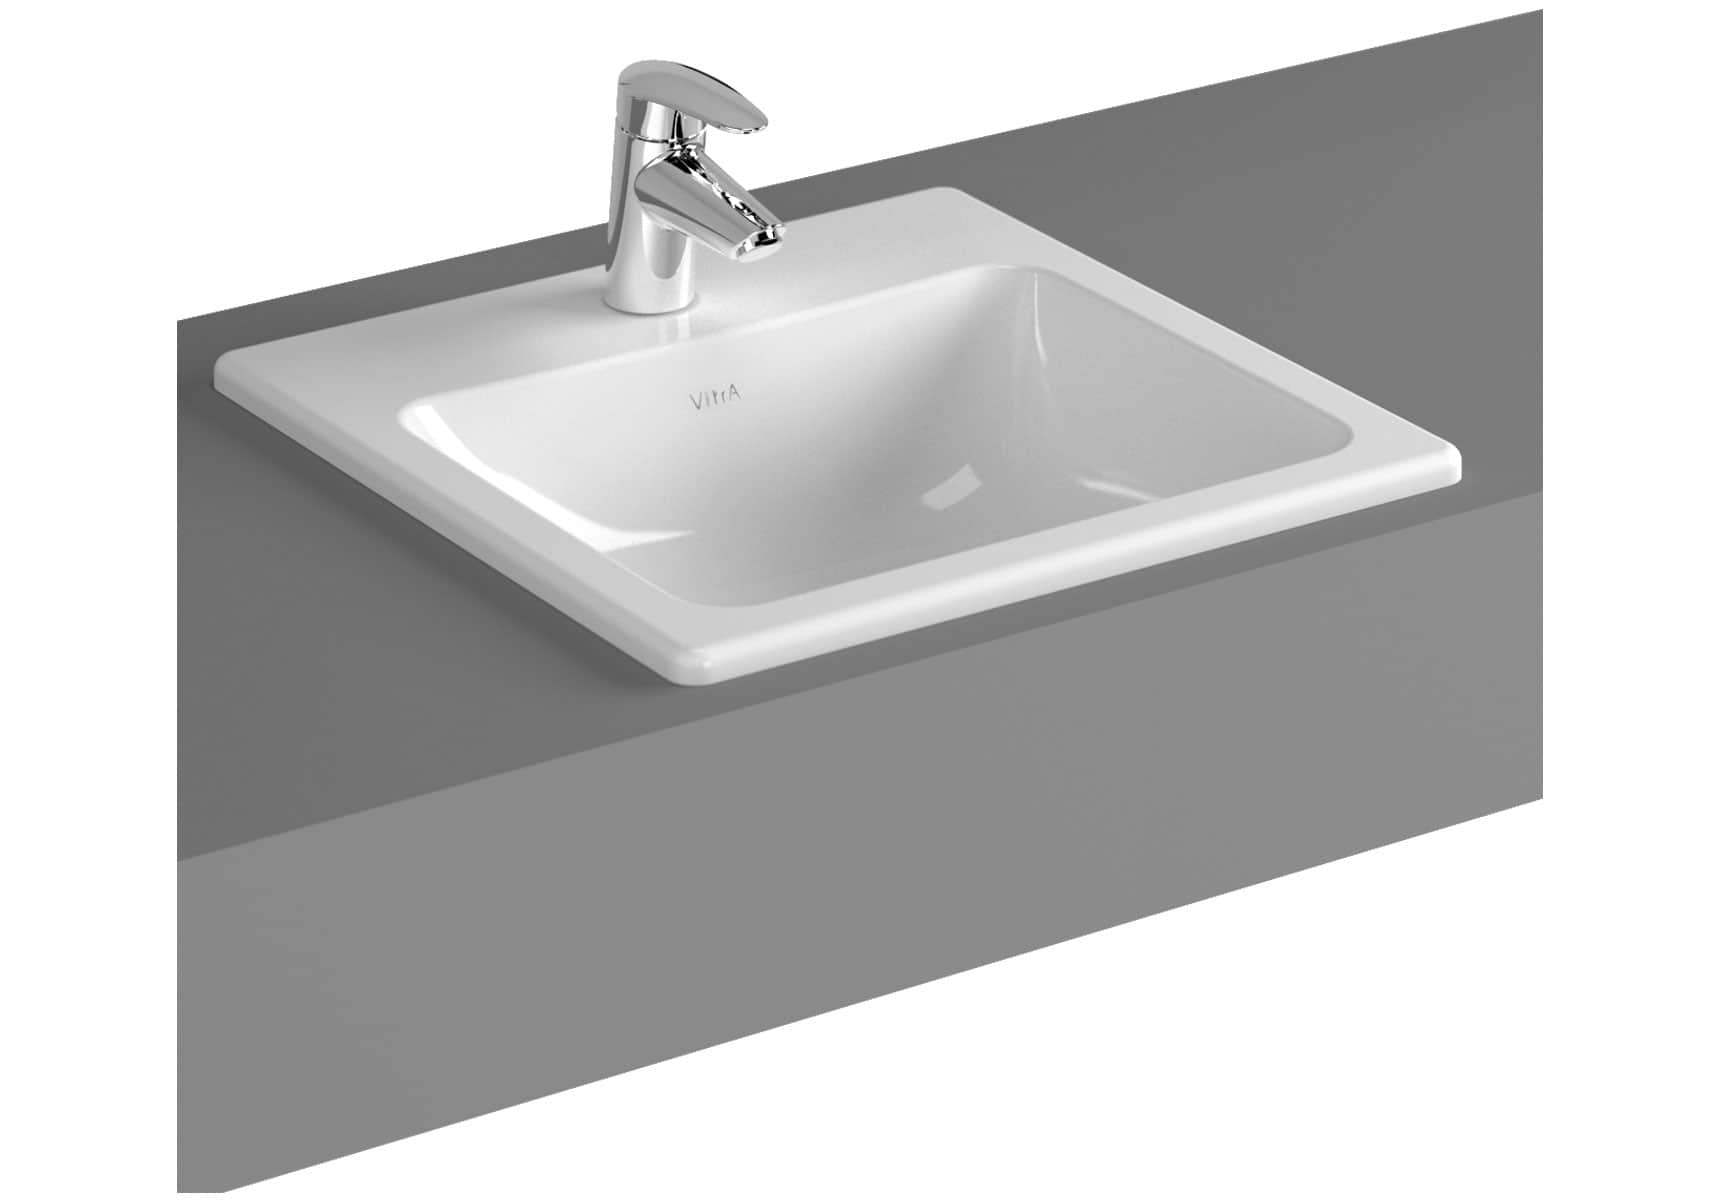 S20 Countertop Basin, 45cm